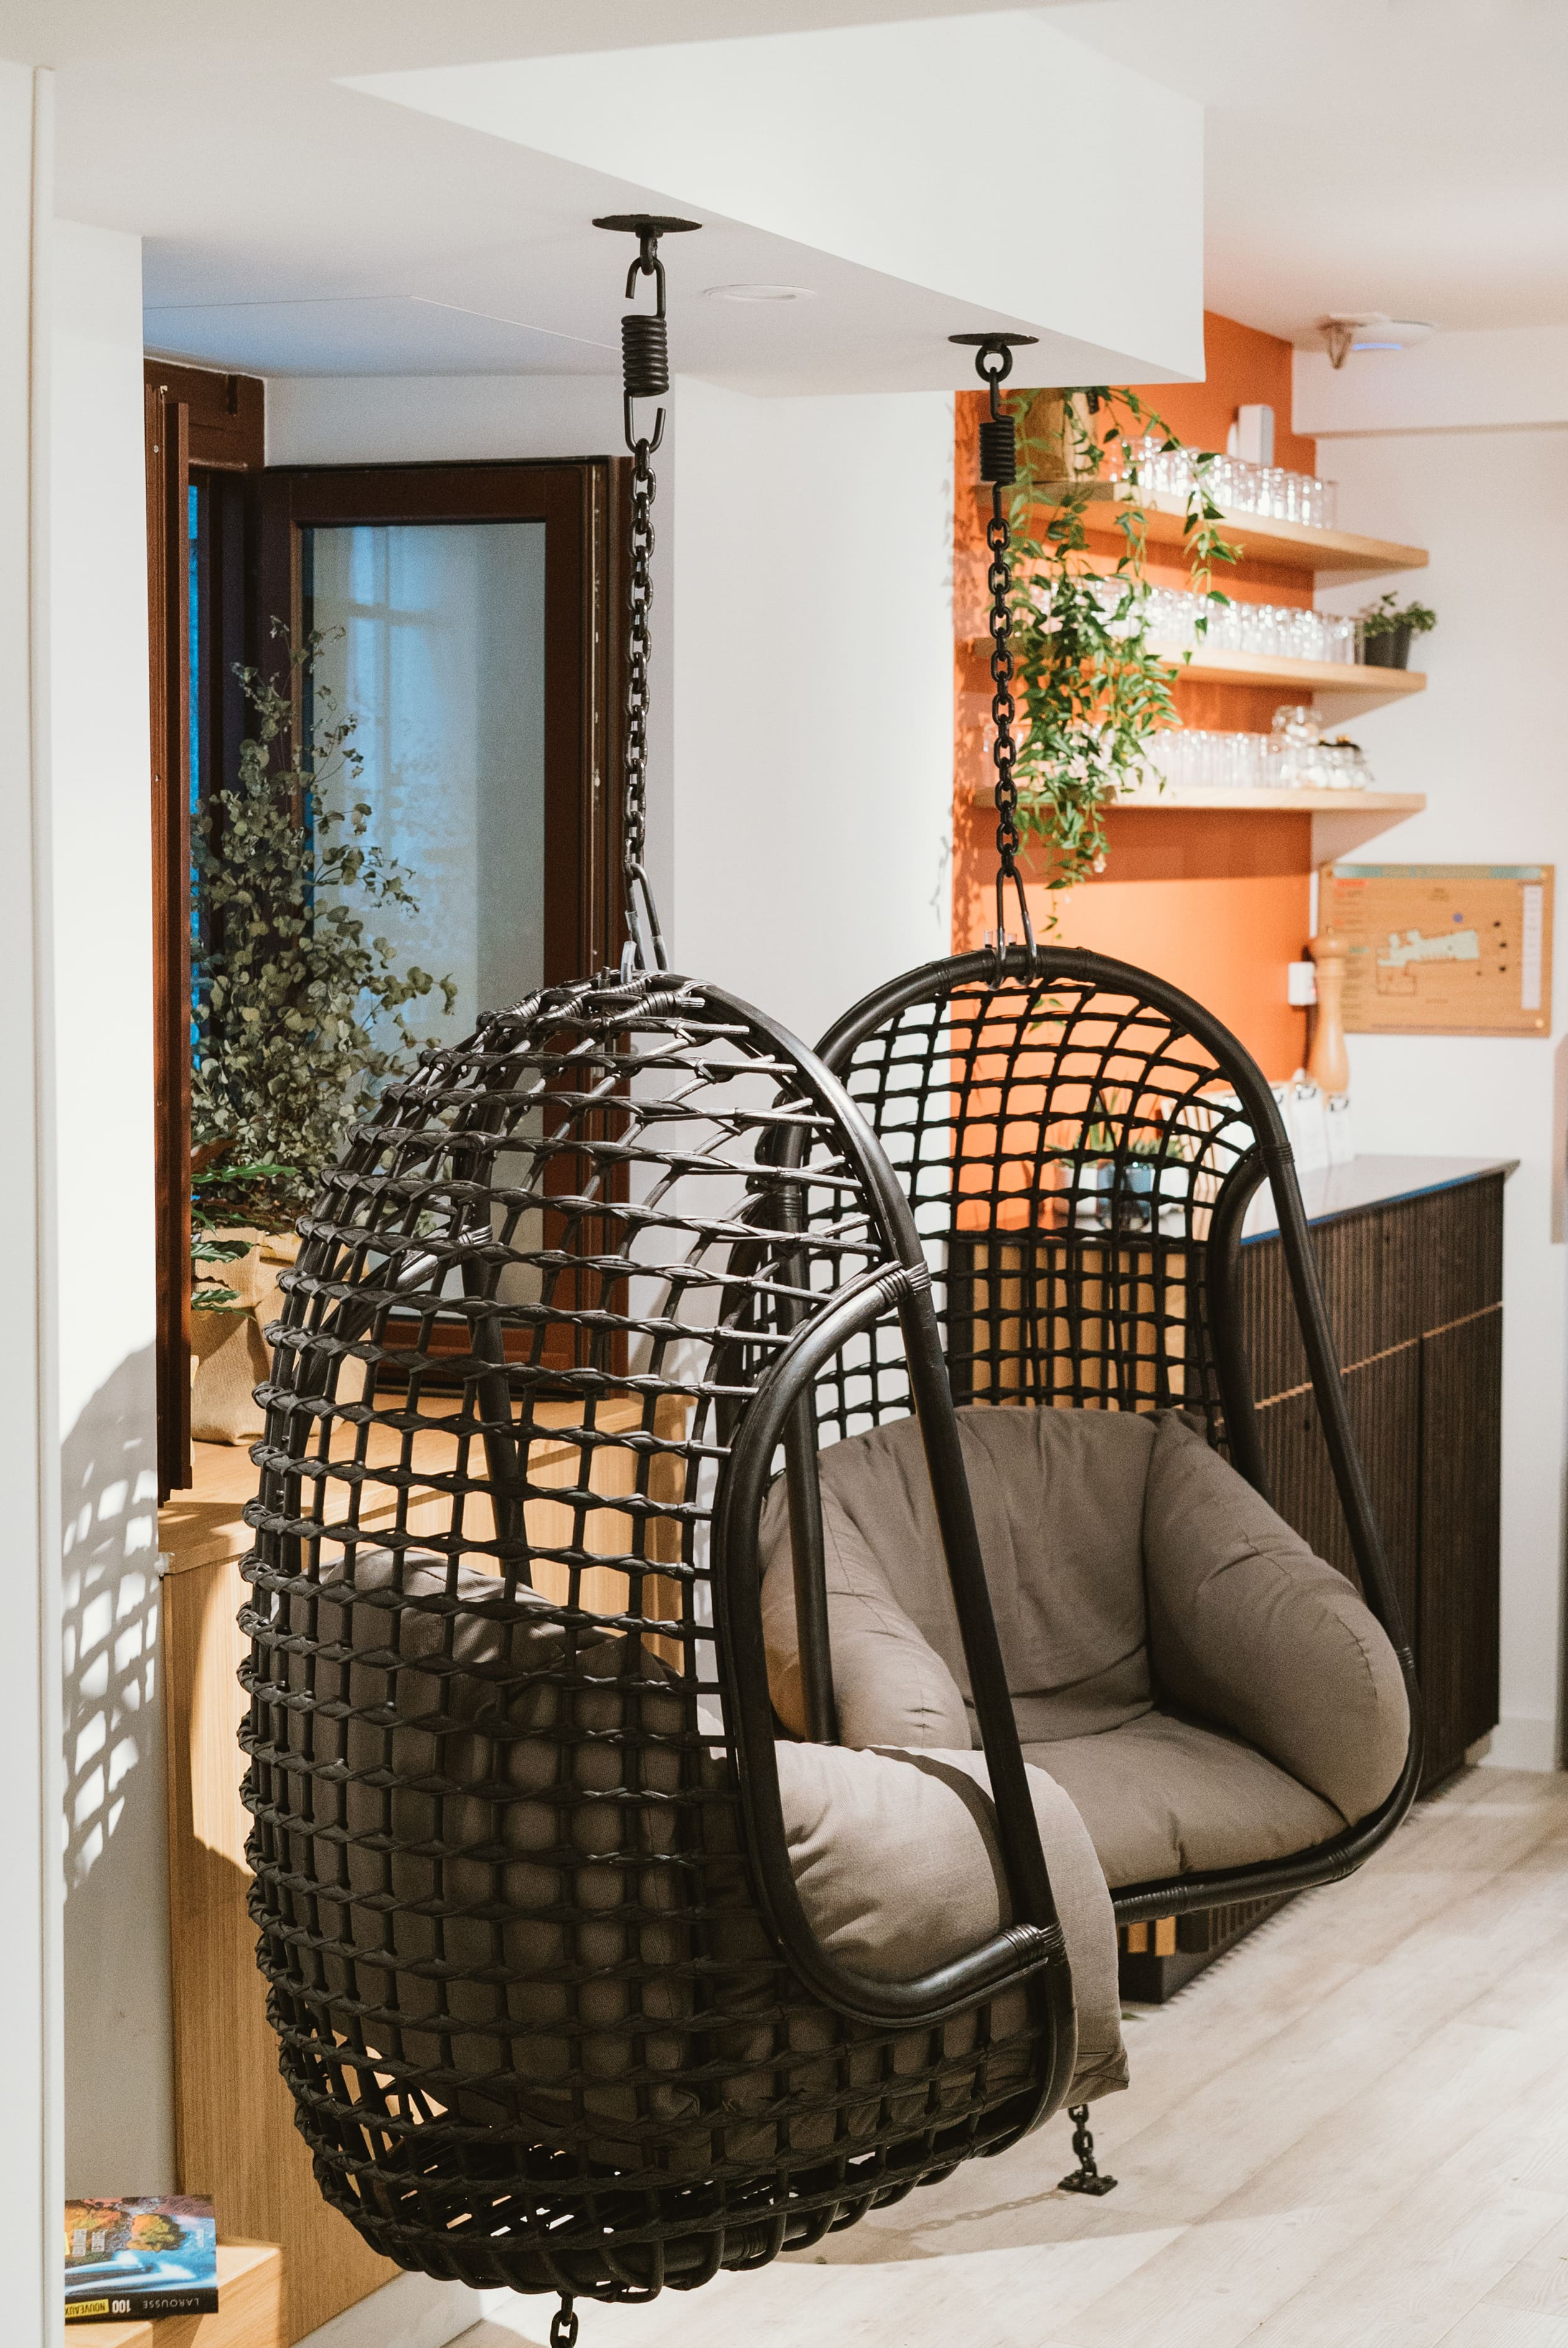 Agencement interieur design métallique ROBI restaurant Haven Annecy 74 agencement en metal 10